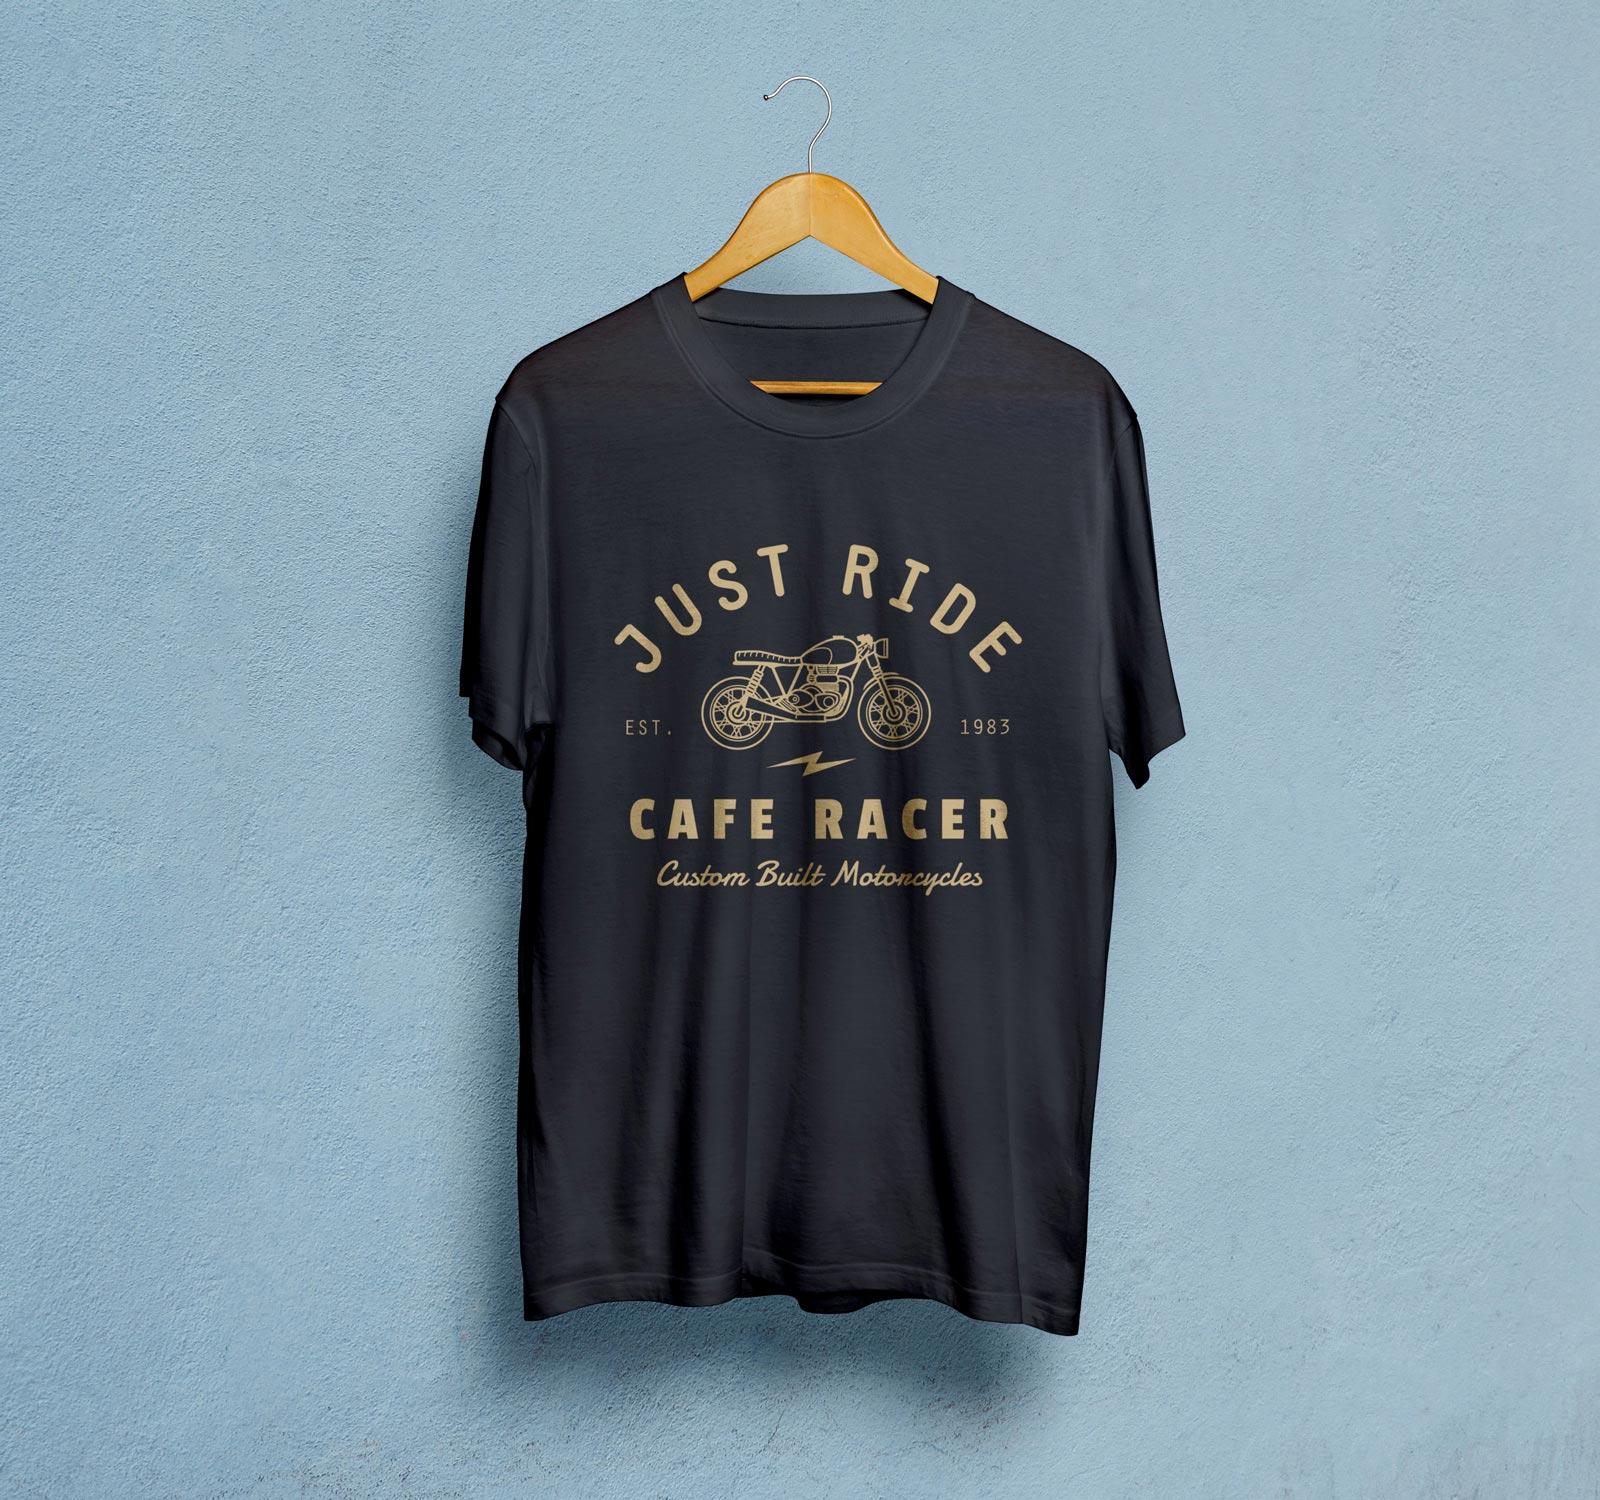 Free-Black-Half-Sleeves-T-Shirt-Mockup-PSD-File